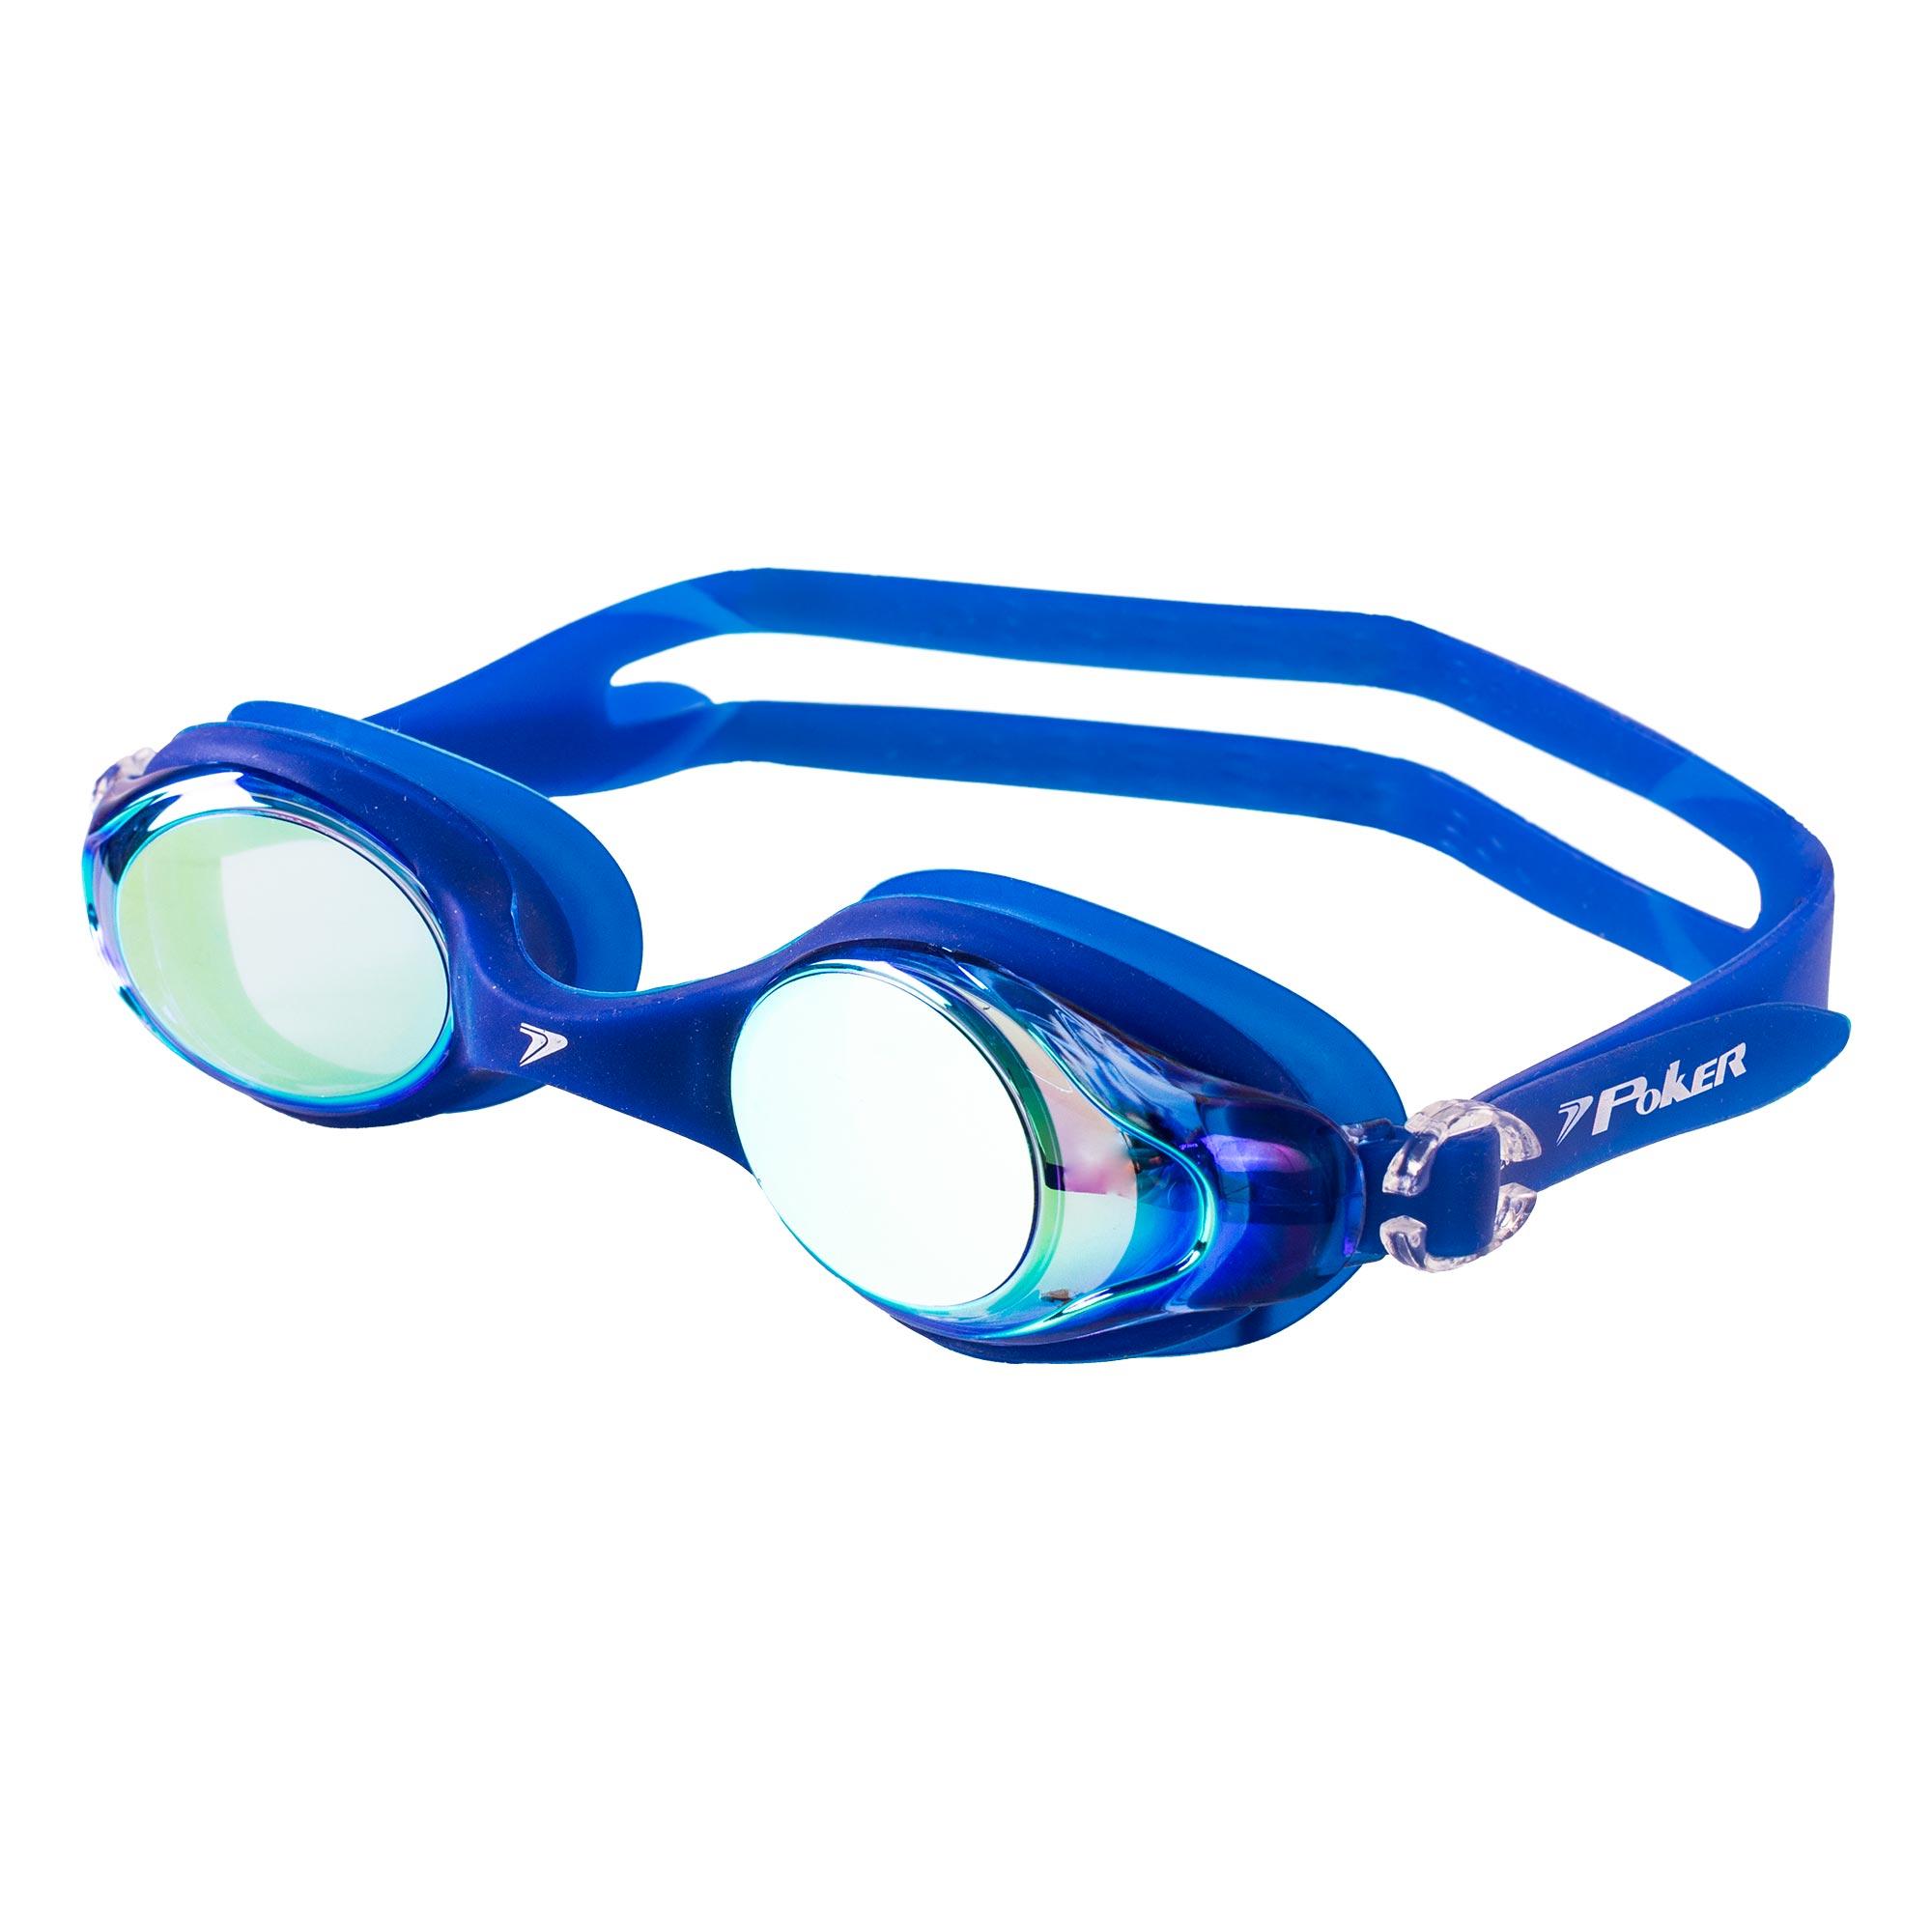 Oculos Natação Myrtos Ultra Mirror 13133